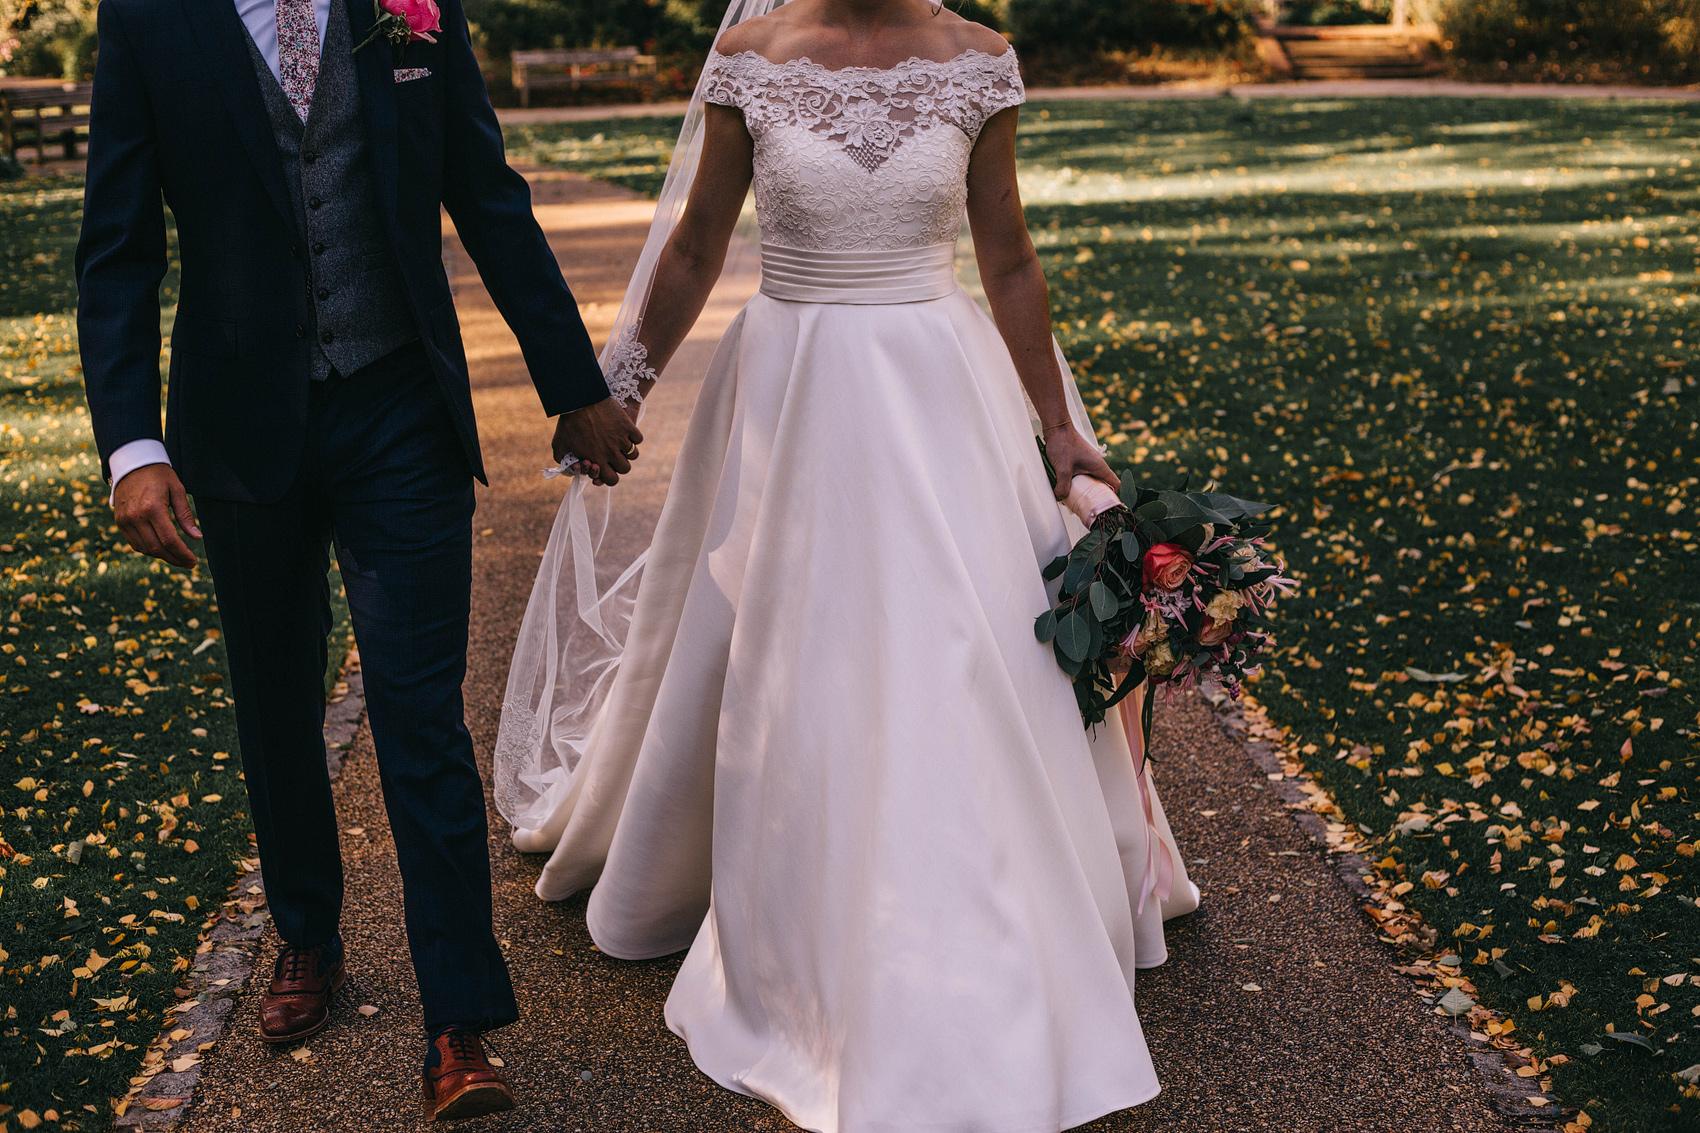 Claire_Basiuk_Richmond_Park,_London_Wedding_Photography_-11.jpg